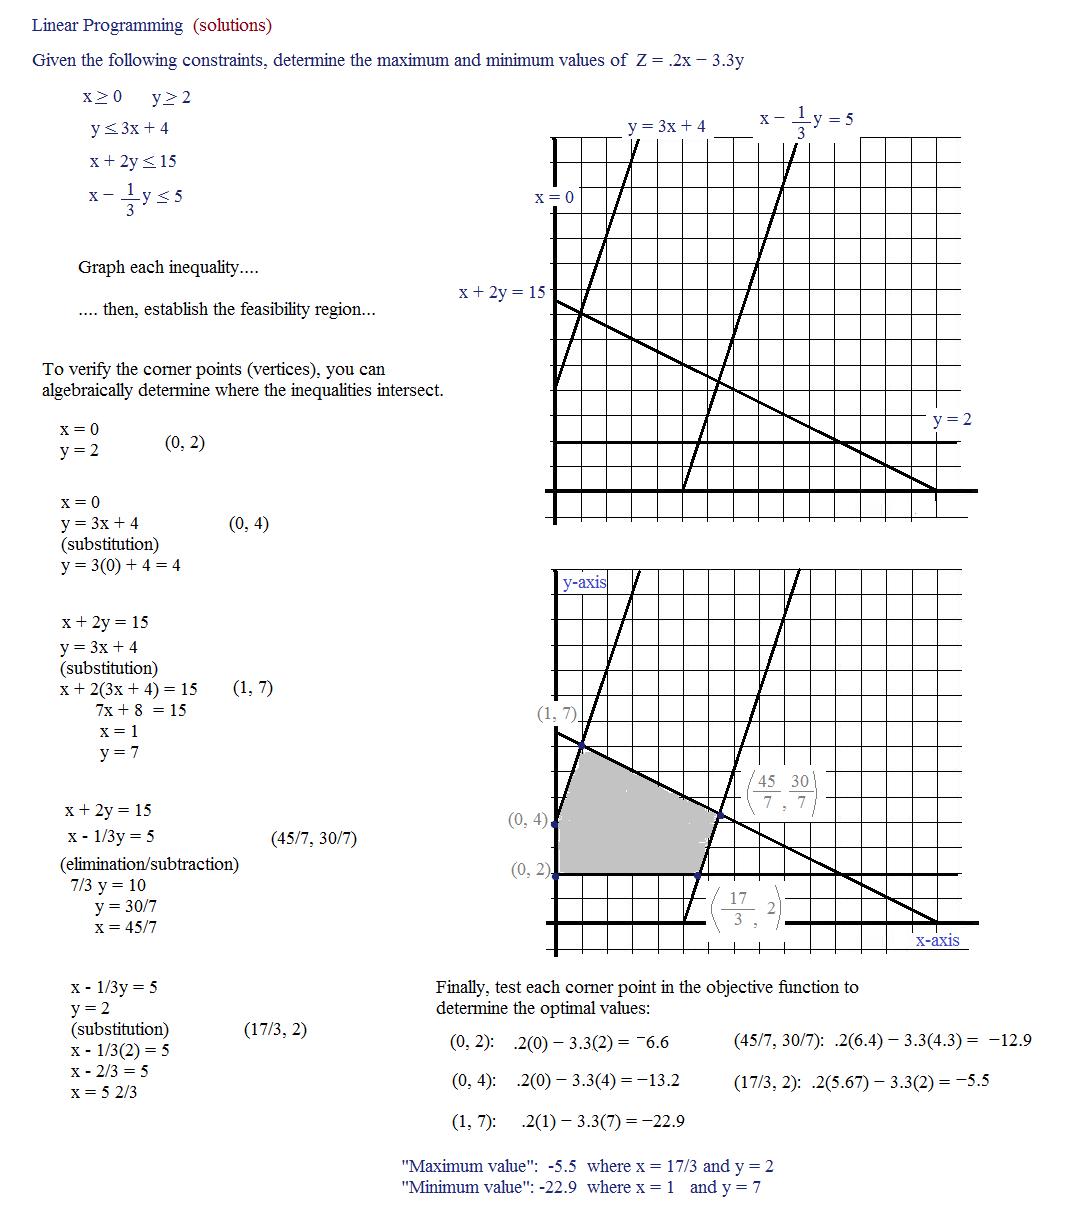 linear inequalities worksheet algebra 2 key algebra 2solving systems of linear inequalities. Black Bedroom Furniture Sets. Home Design Ideas